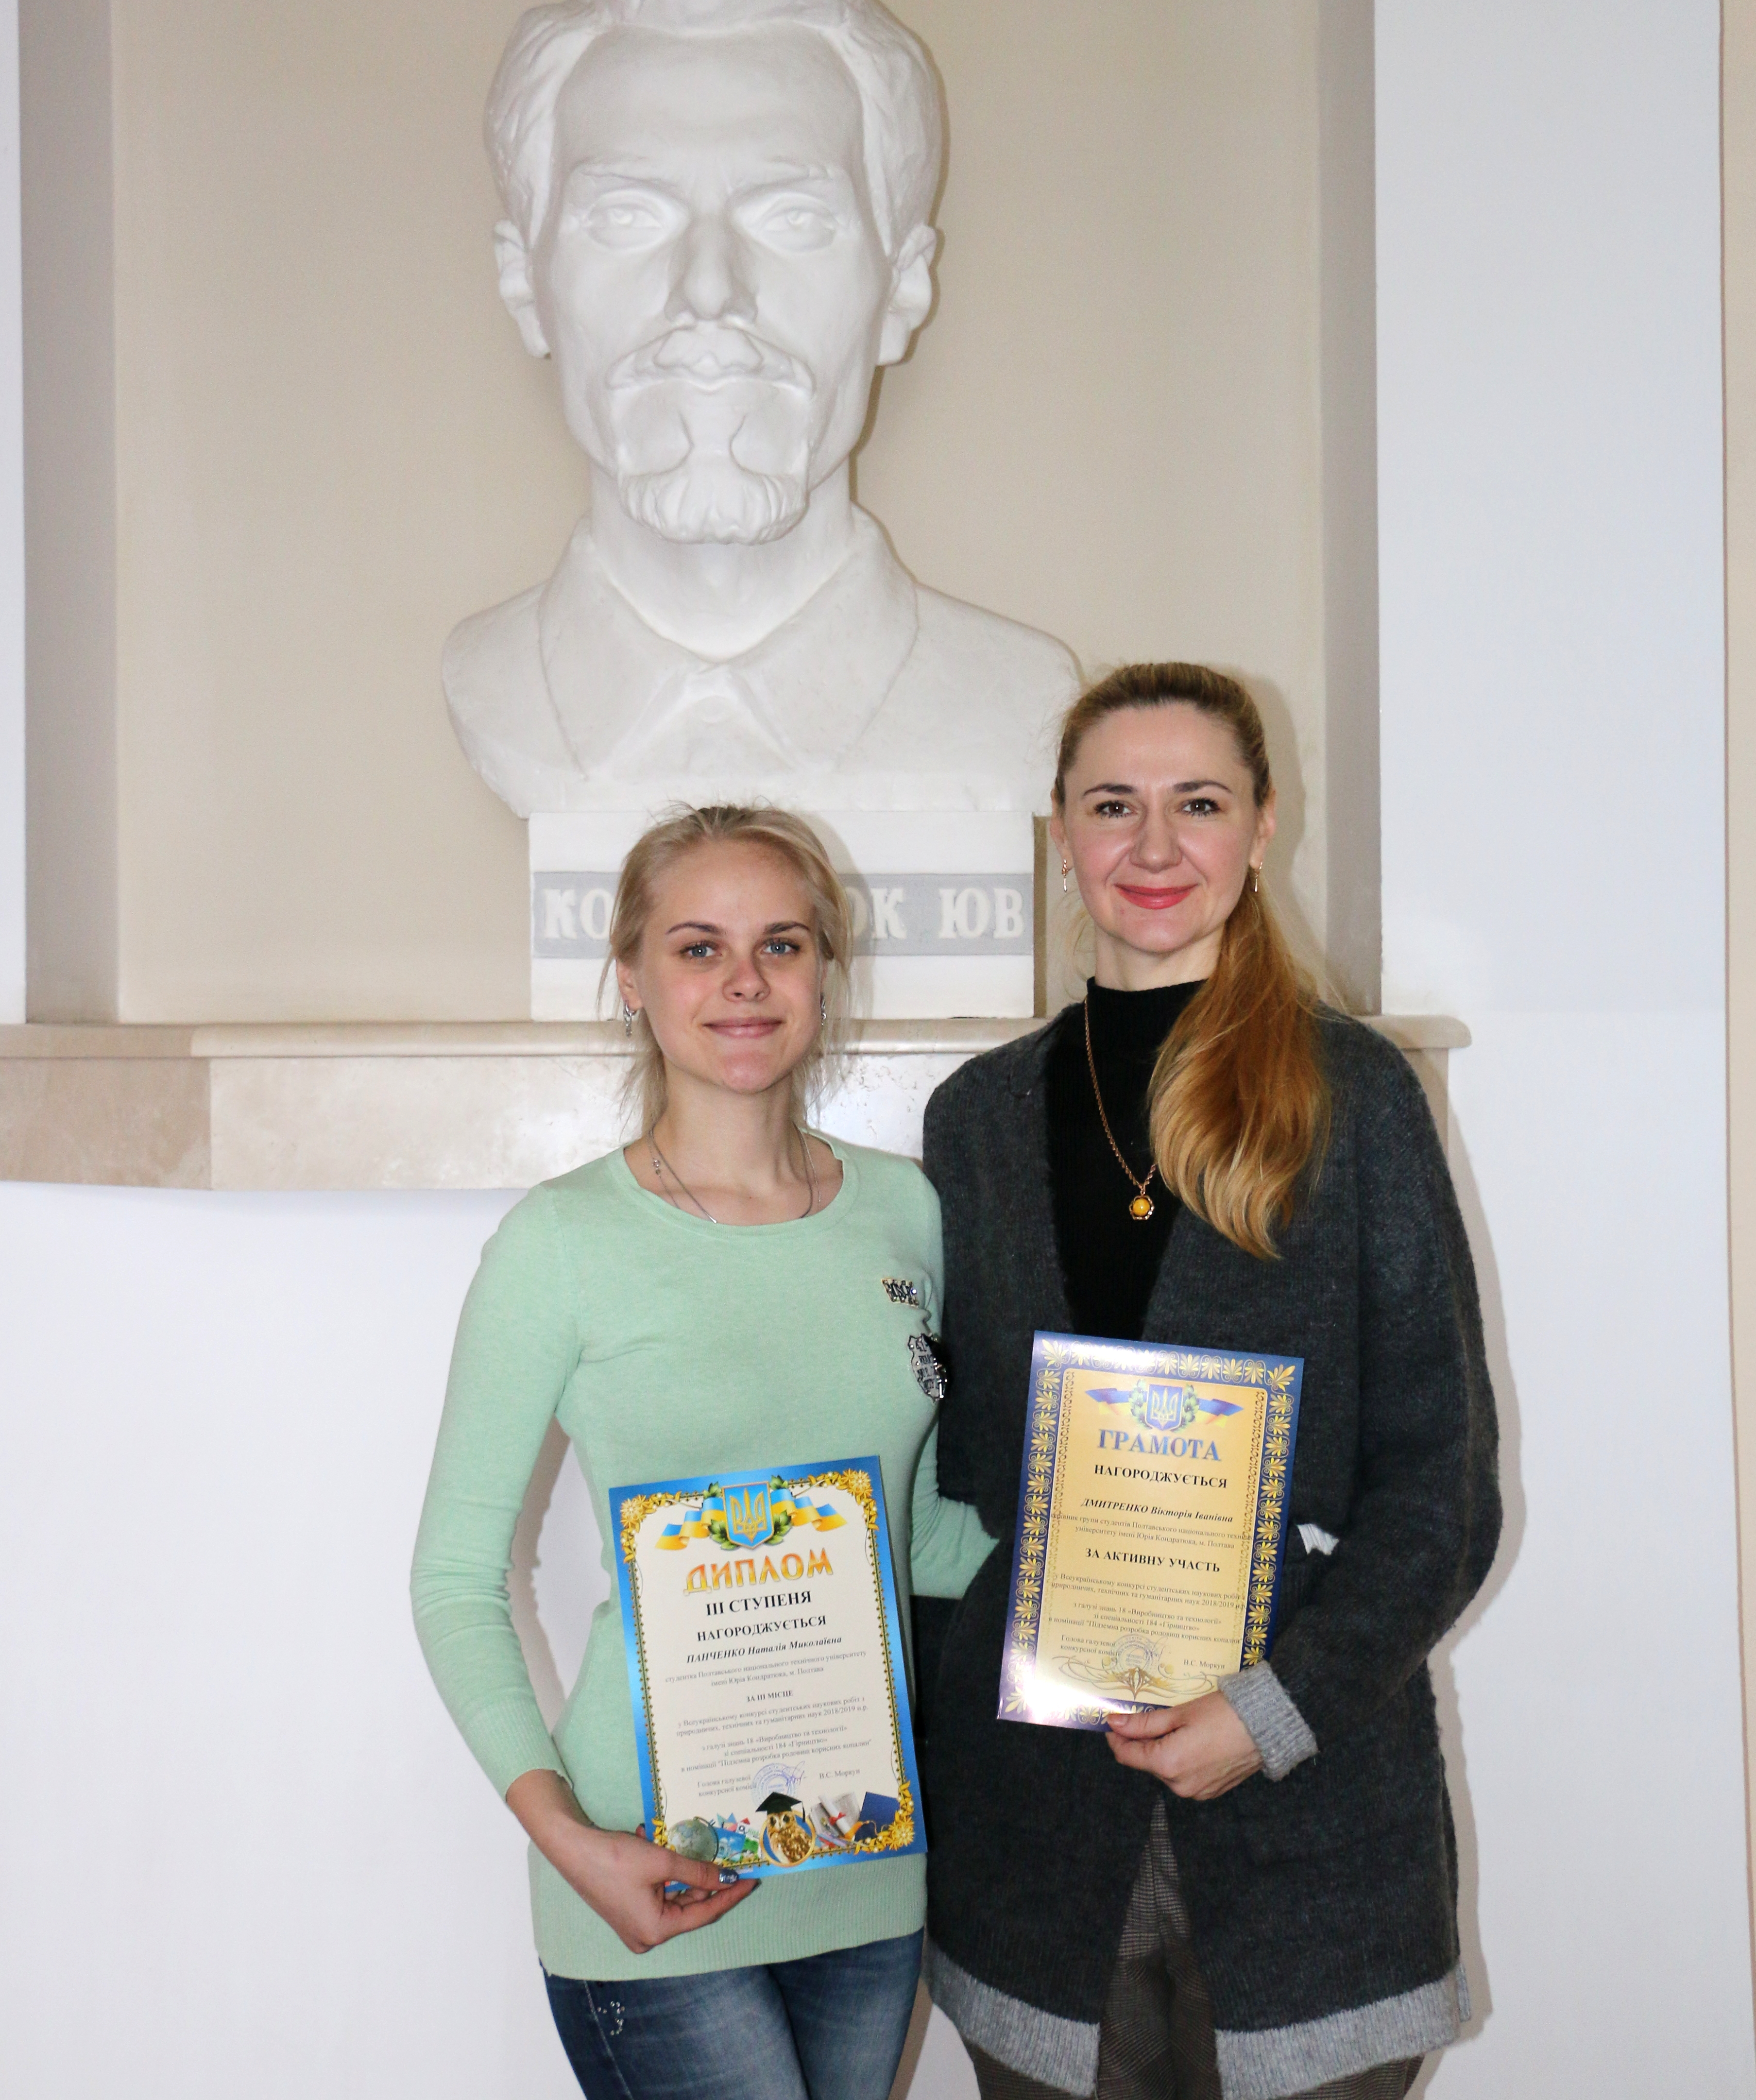 Студенти ПолтНТУ стали переможцями Всеукраїнського конкурсу студентських наукових робіт